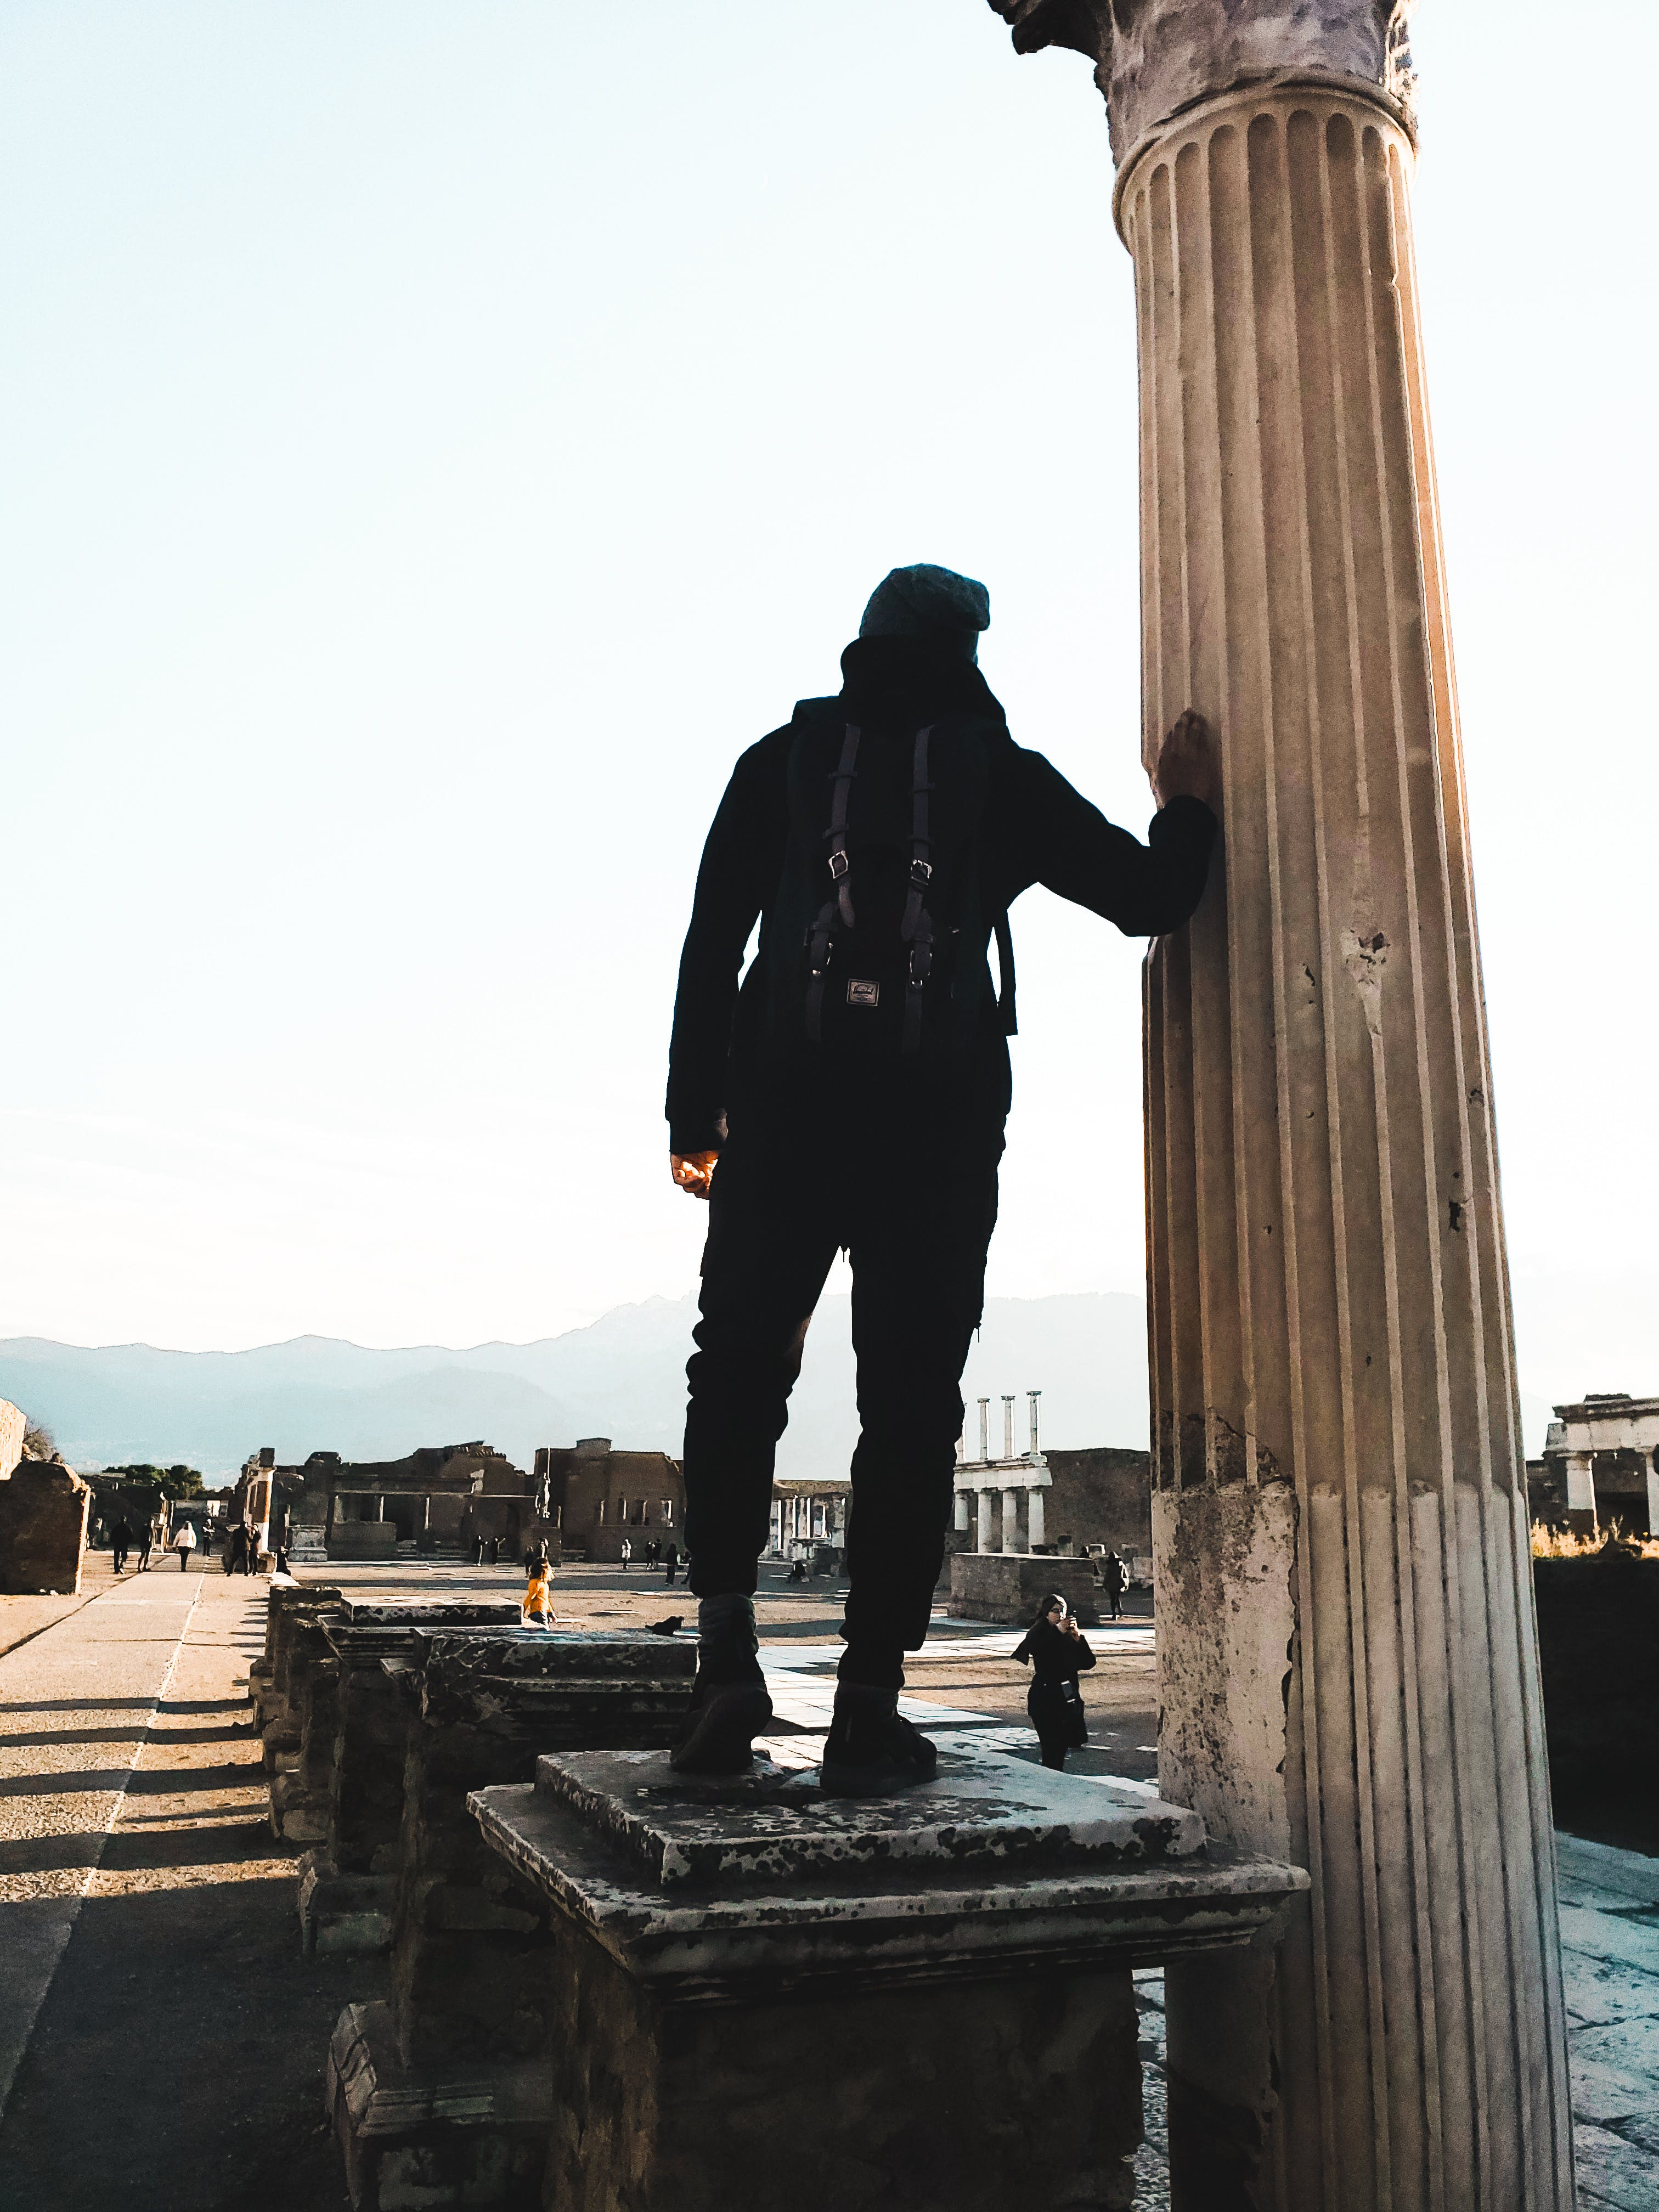 Fotos de stock gratuitas de antiguo, hombre, hora dorada, Italia